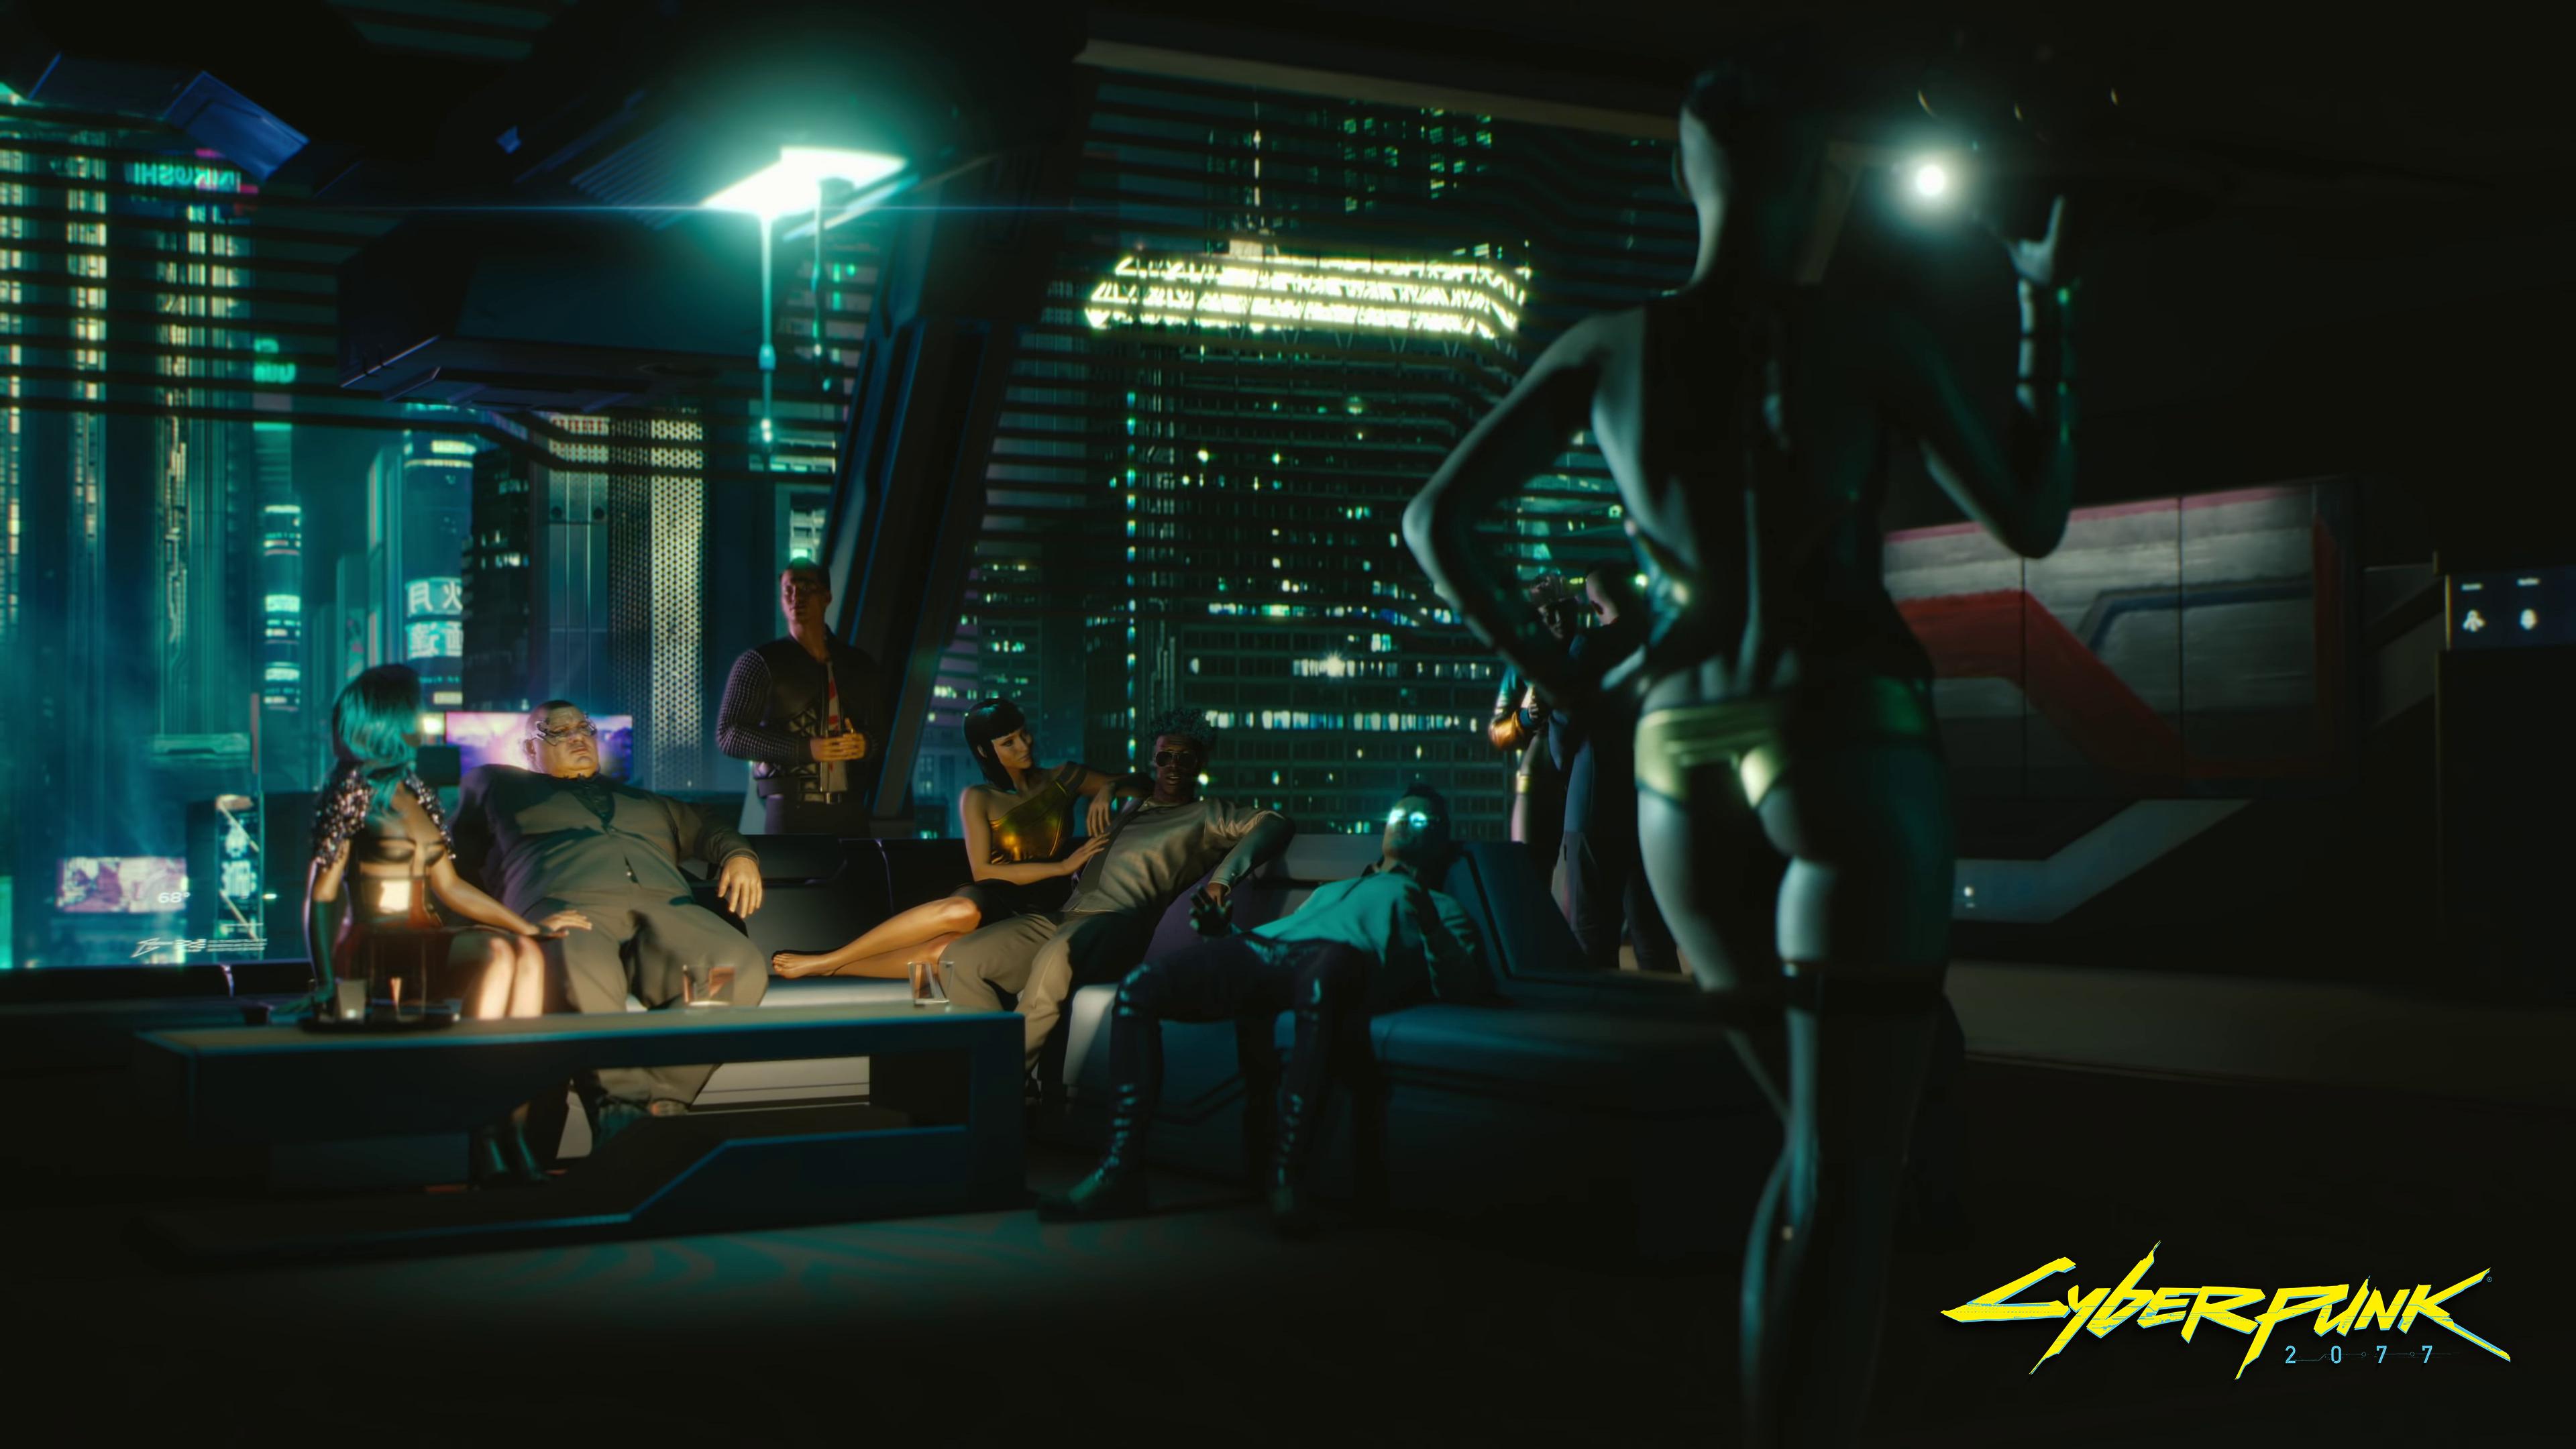 Contact Cyberpunk 2077